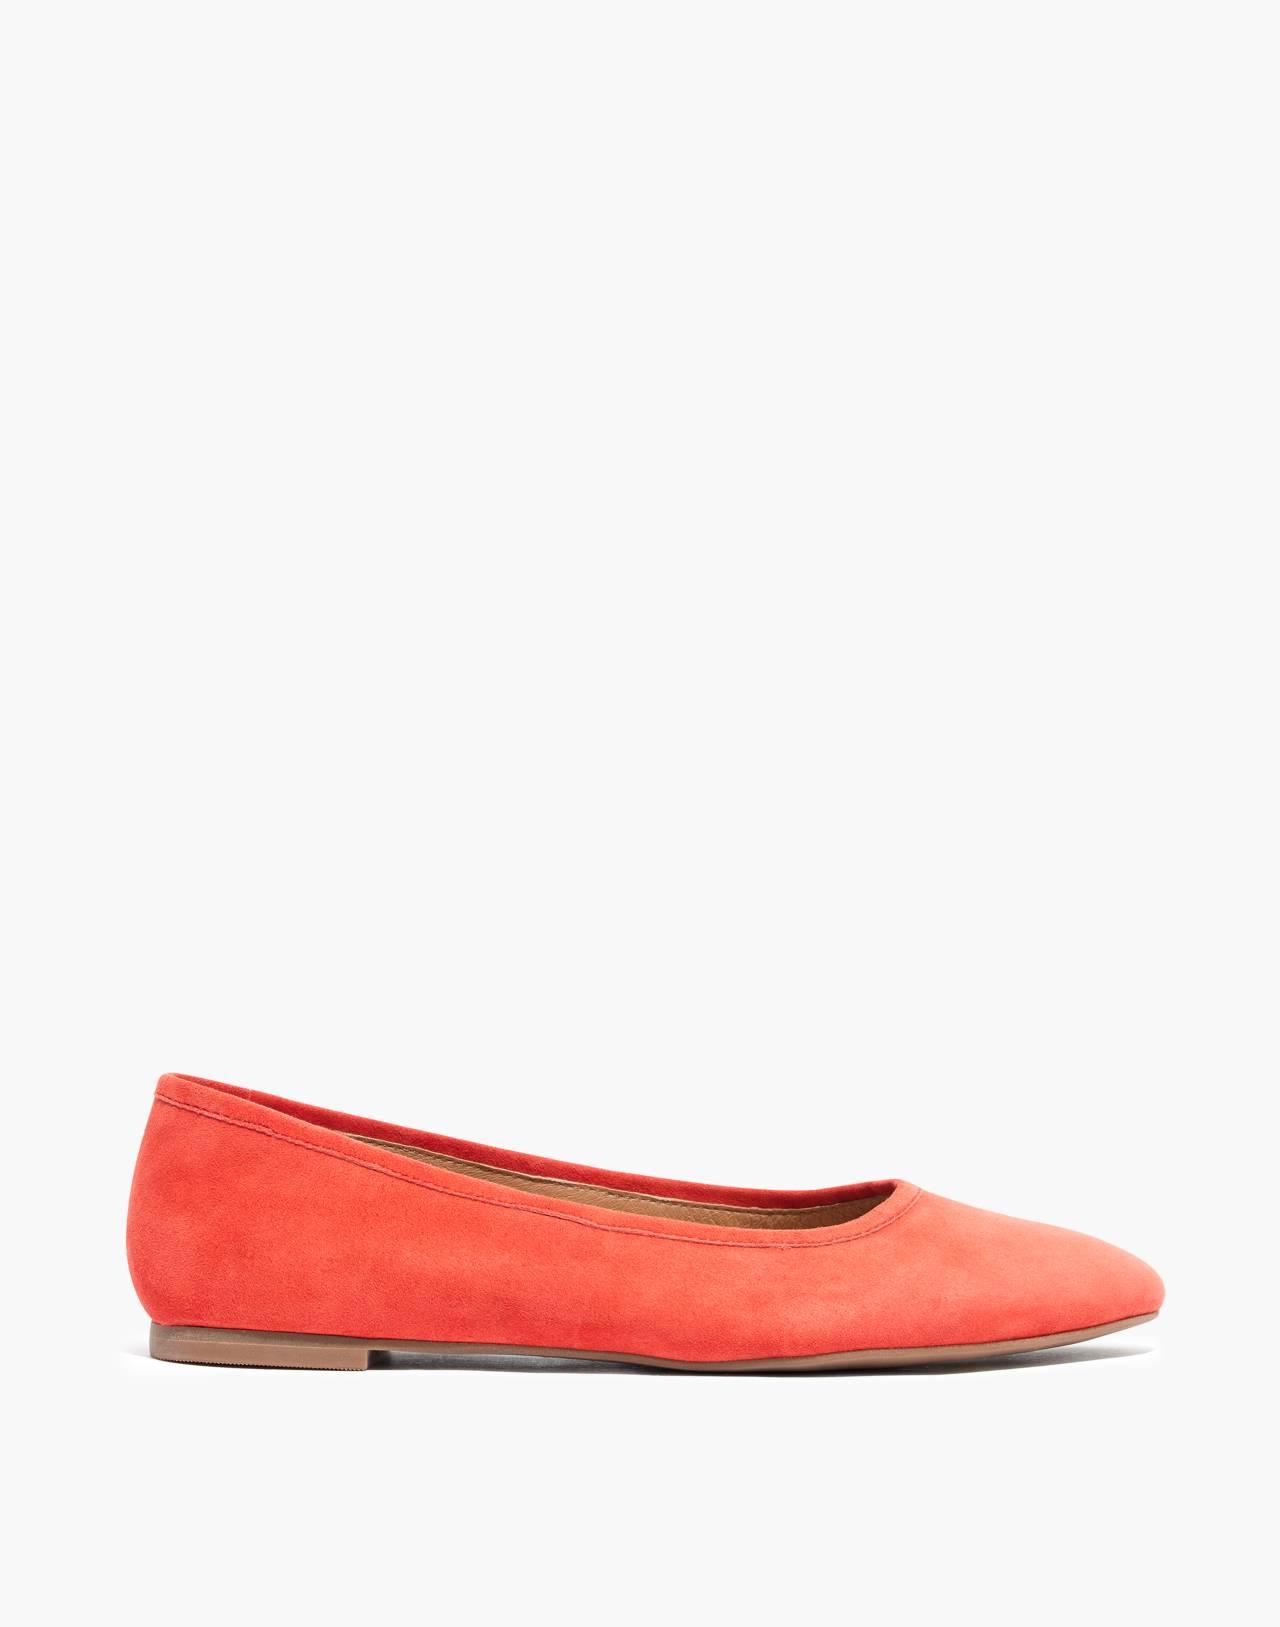 The Reid Ballet Flat in Suede in coastal orange image 2